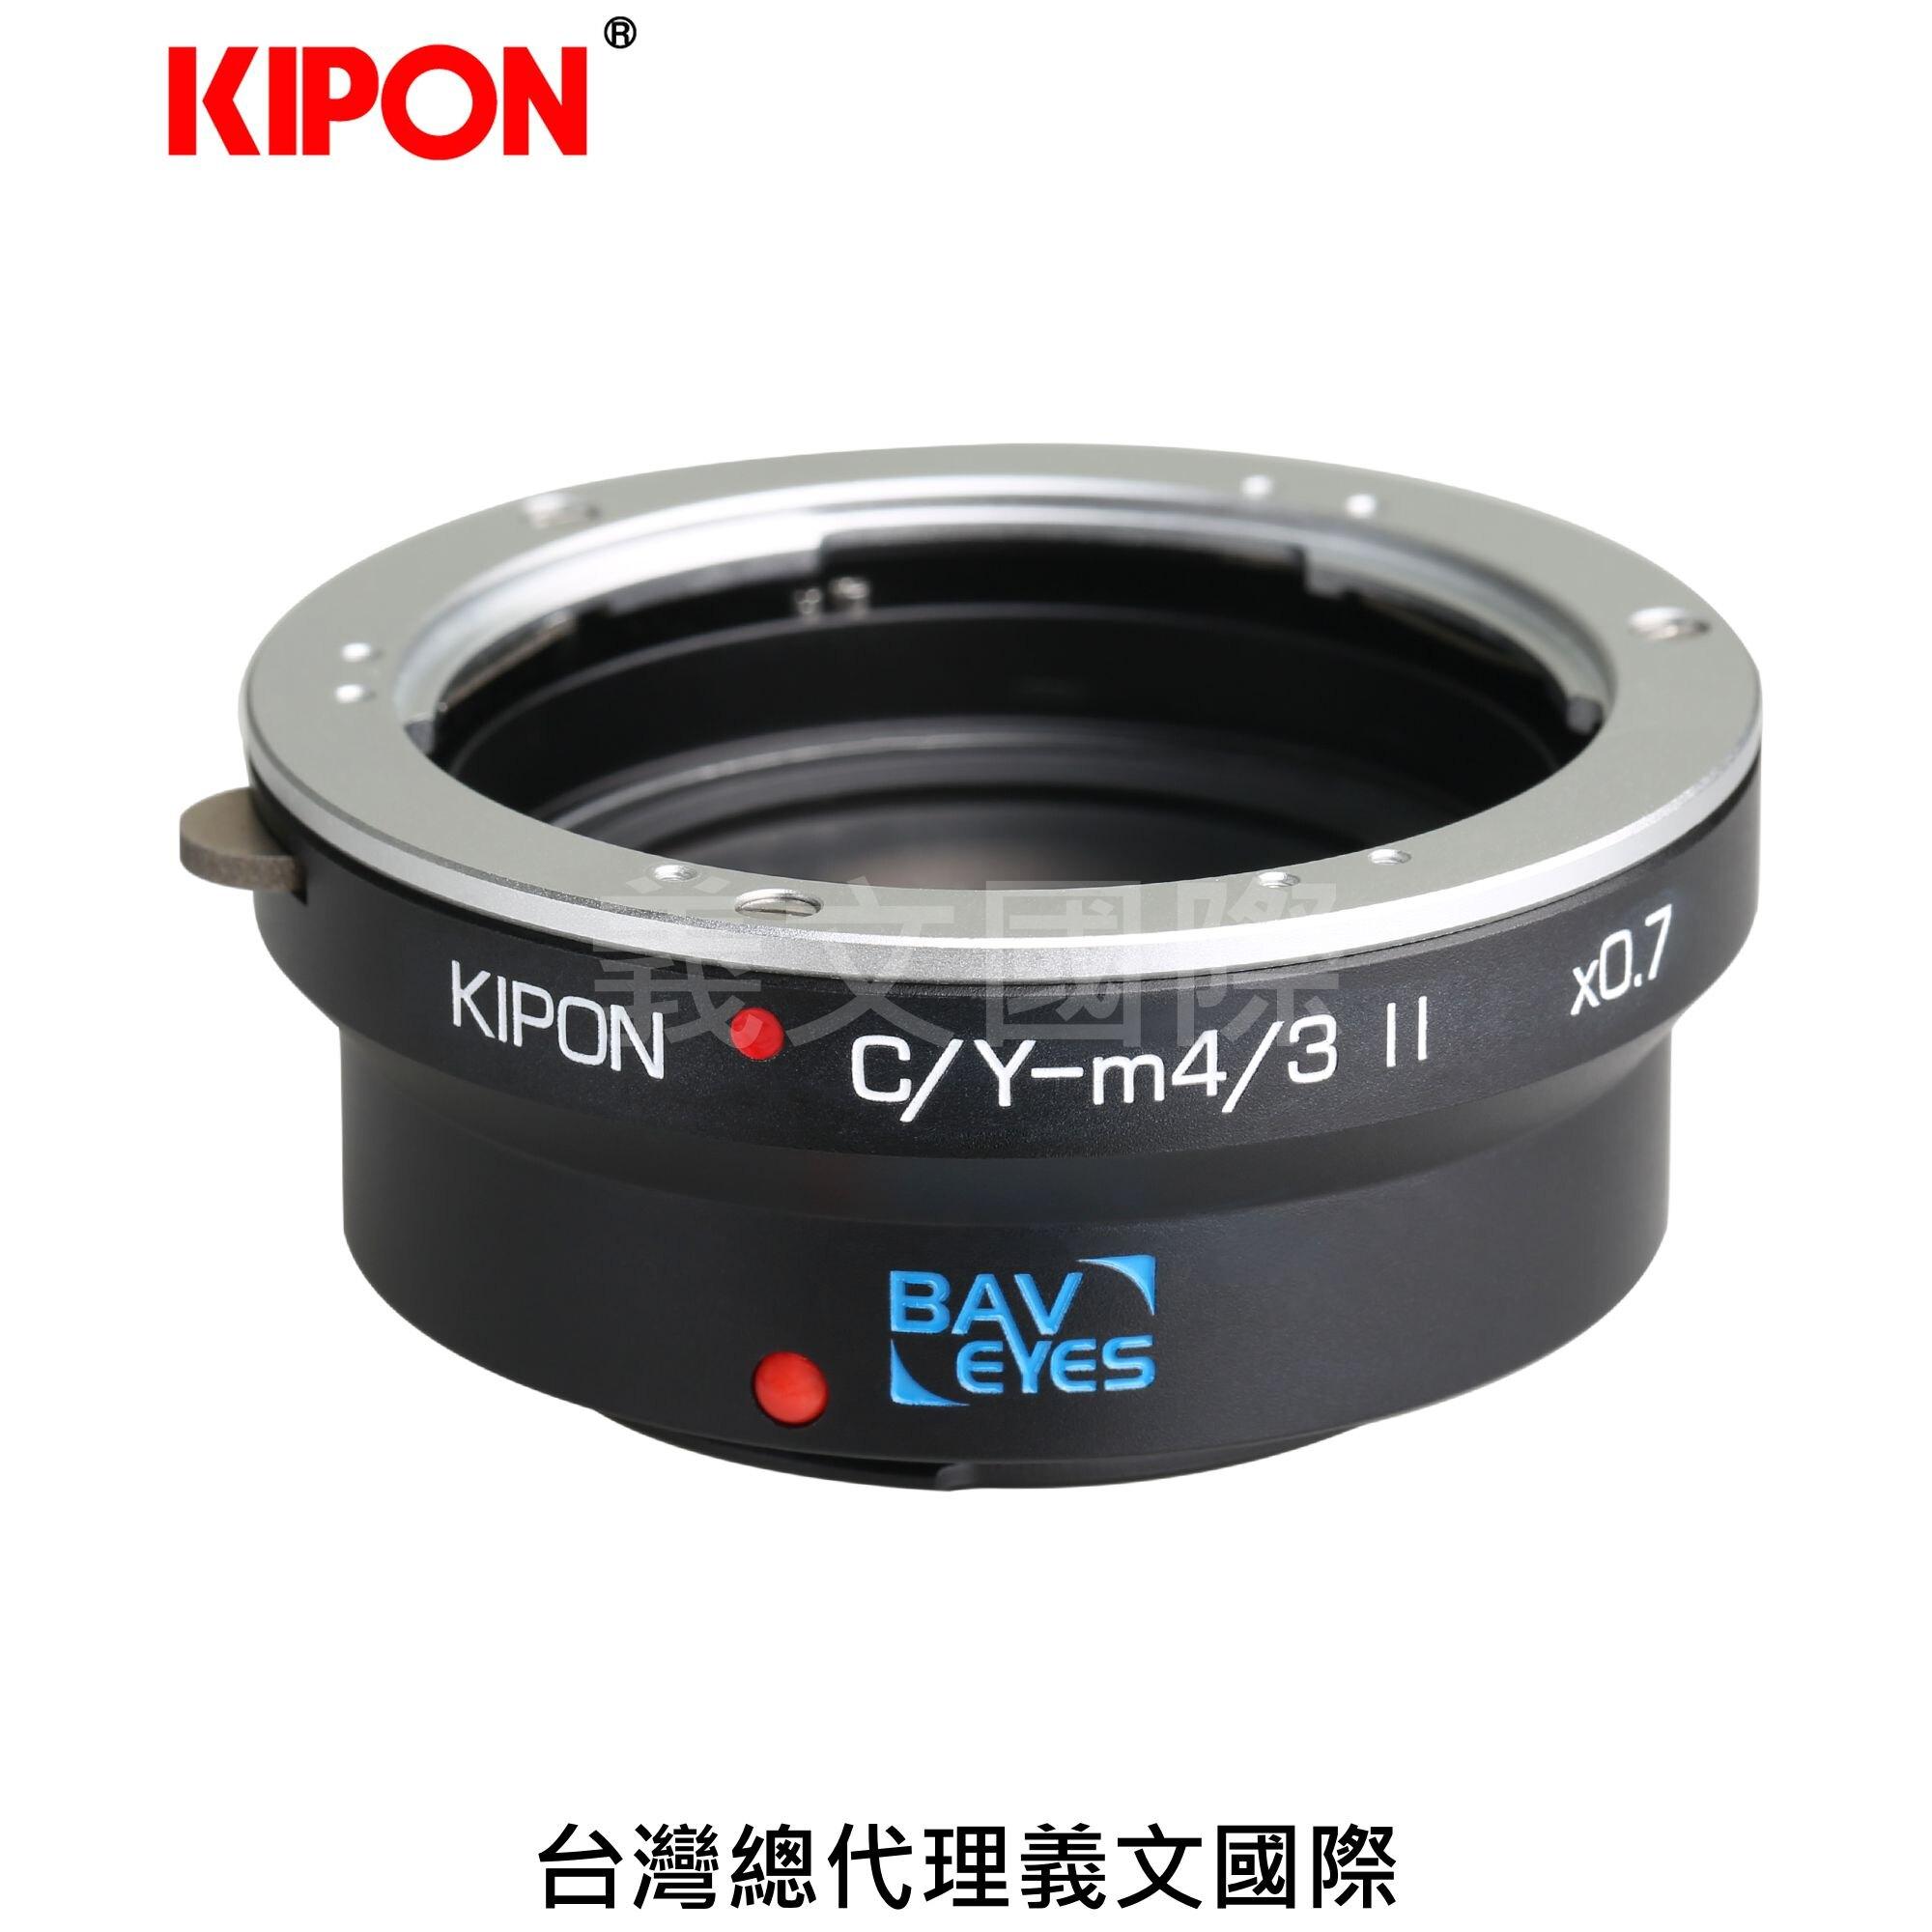 Kipon轉接環專賣店:Baveyes C/Y-m4/3 0.7x II(for Panasonic GX7/GX1/G10/GF6/GF5/GF3/GF2/GM1)